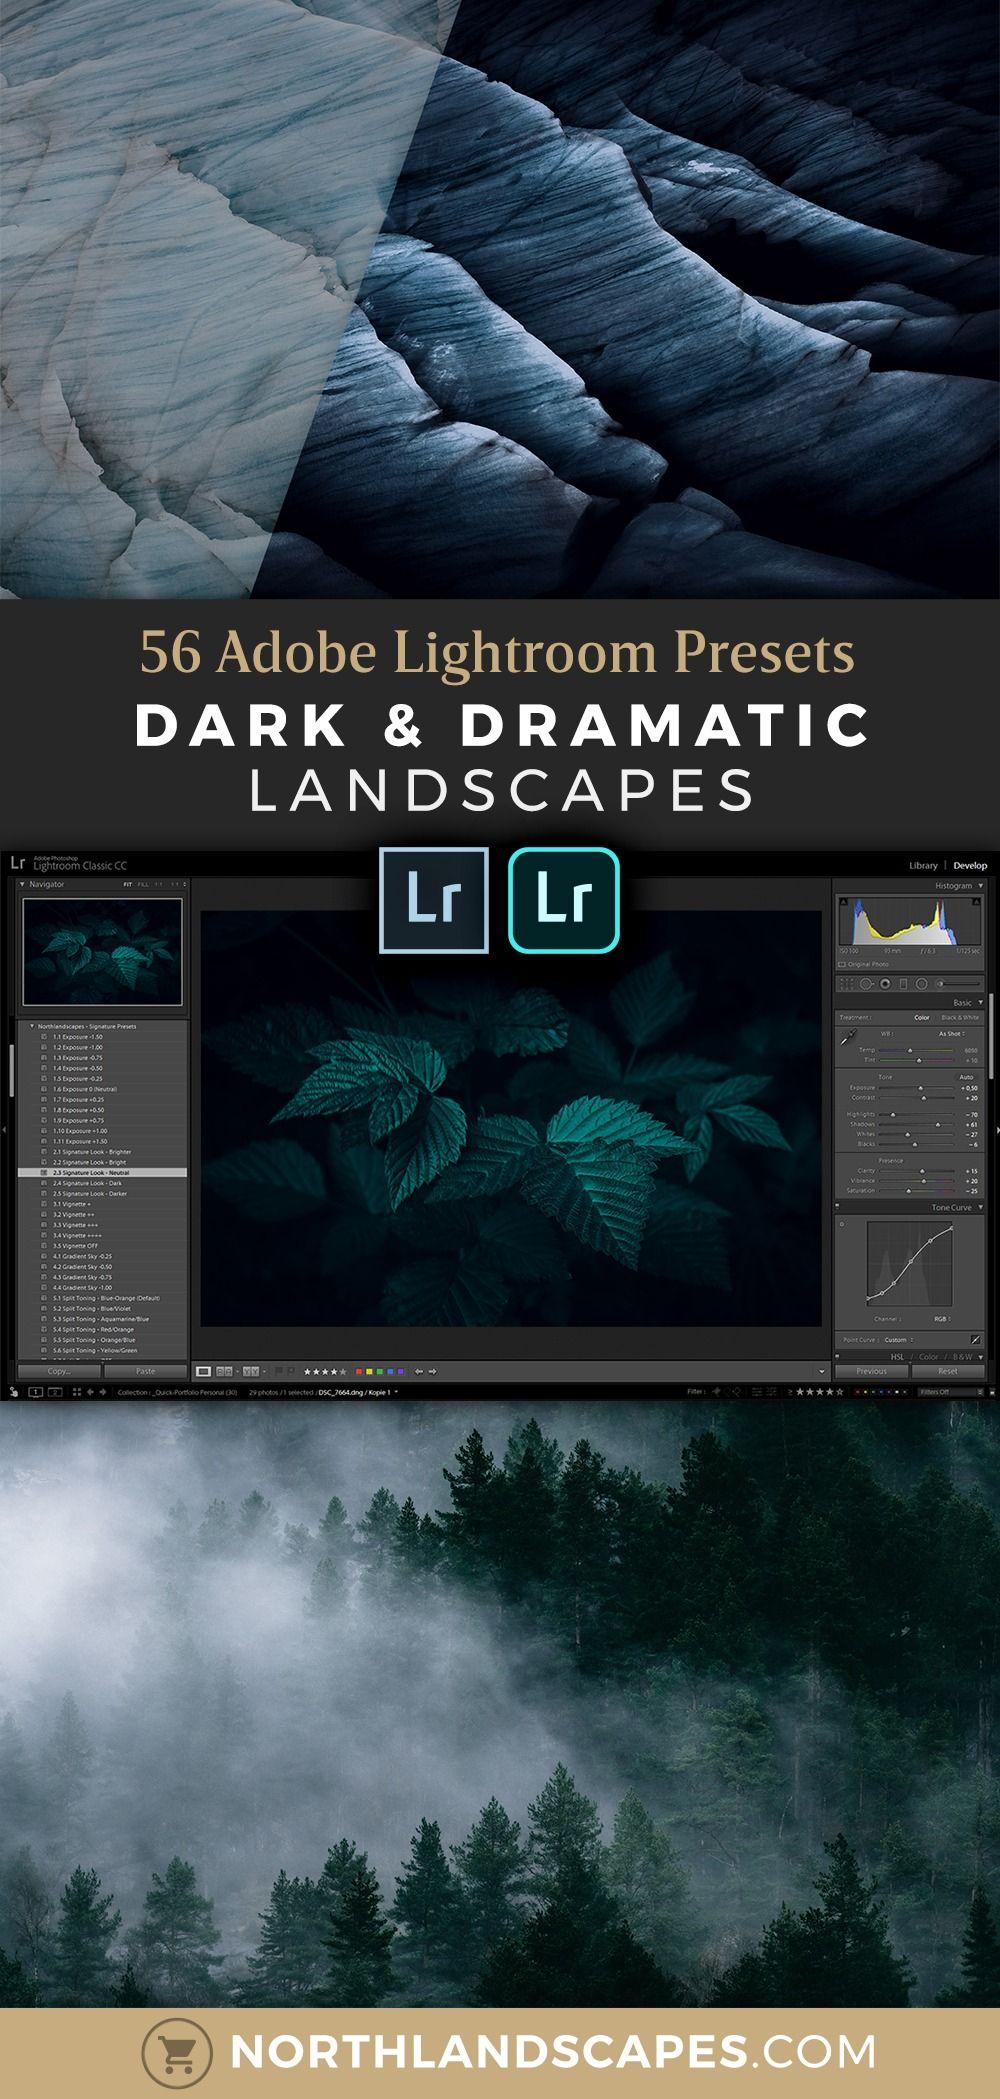 Lightroom reset to original